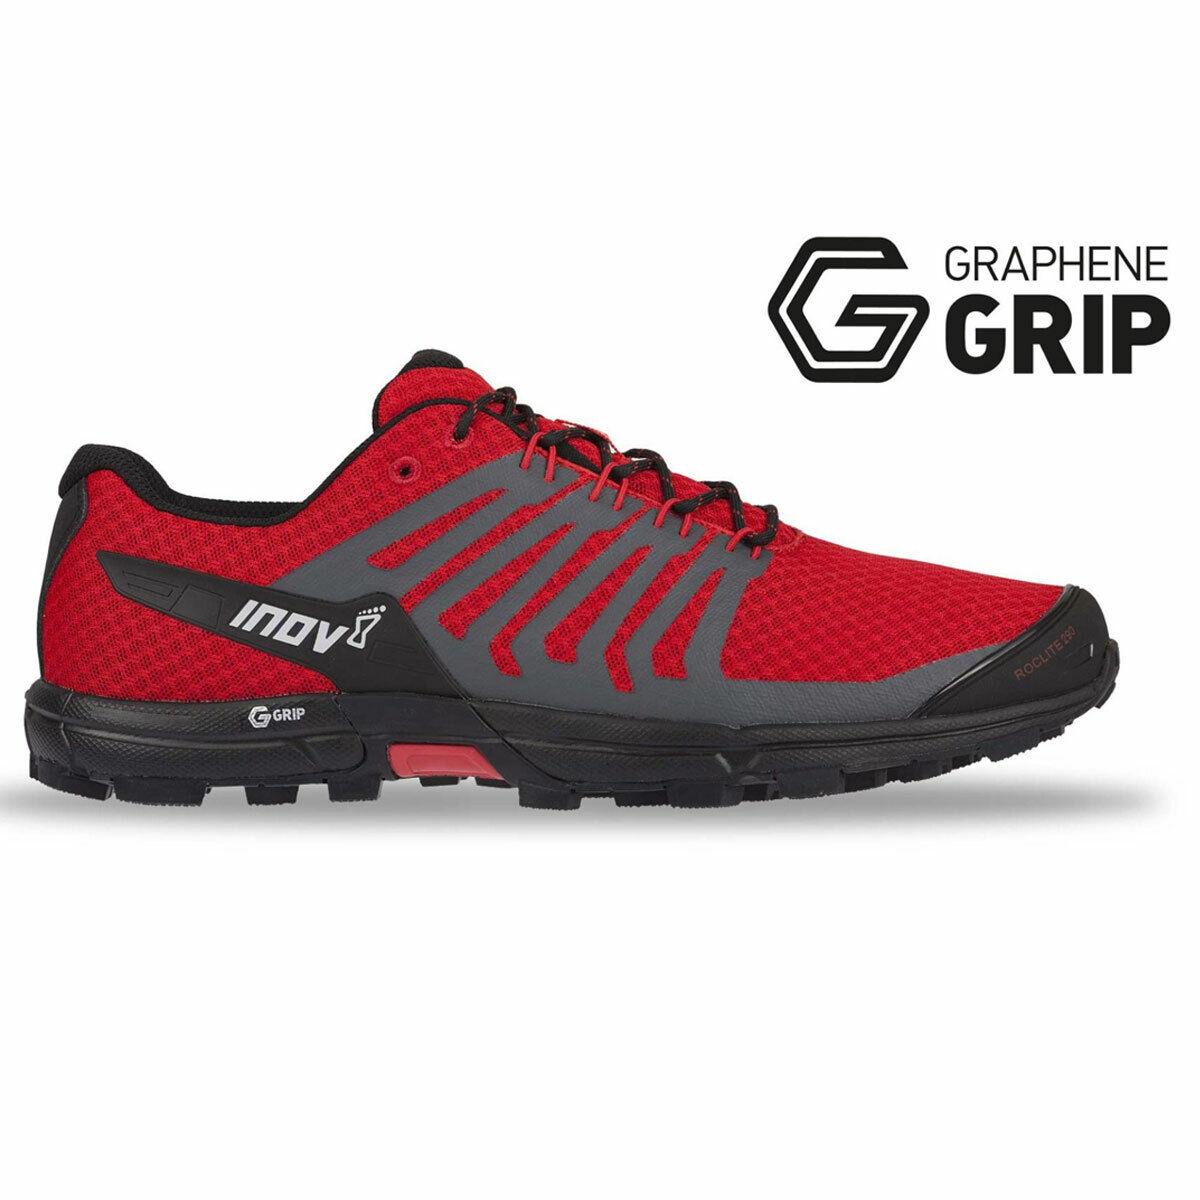 Inov 8 roclite g 290 Men   000809 rdbk   trailrunning zapato   graphene Grip